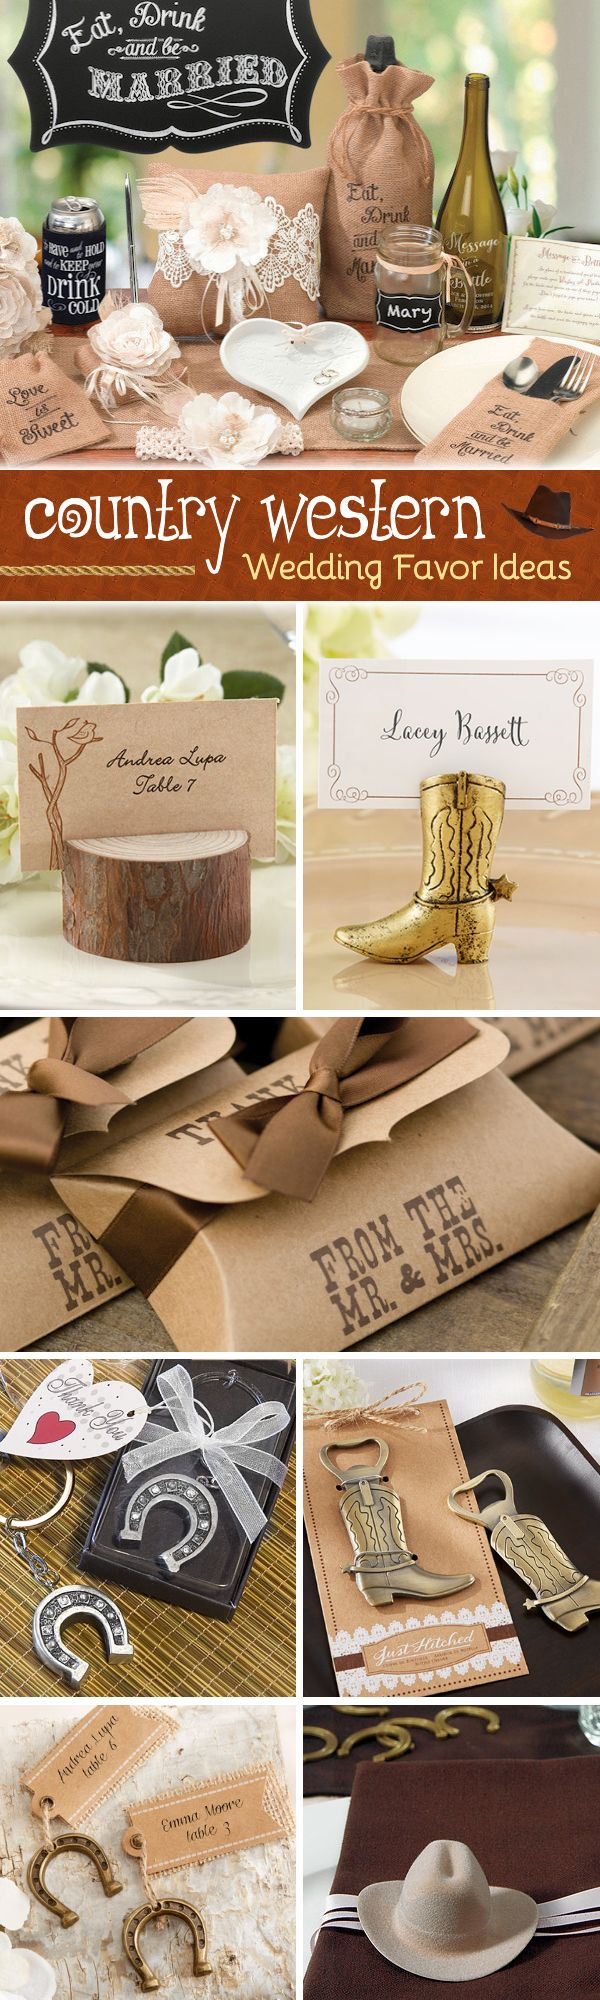 100+ Country Western & Rustic Wedding Favor Ideas